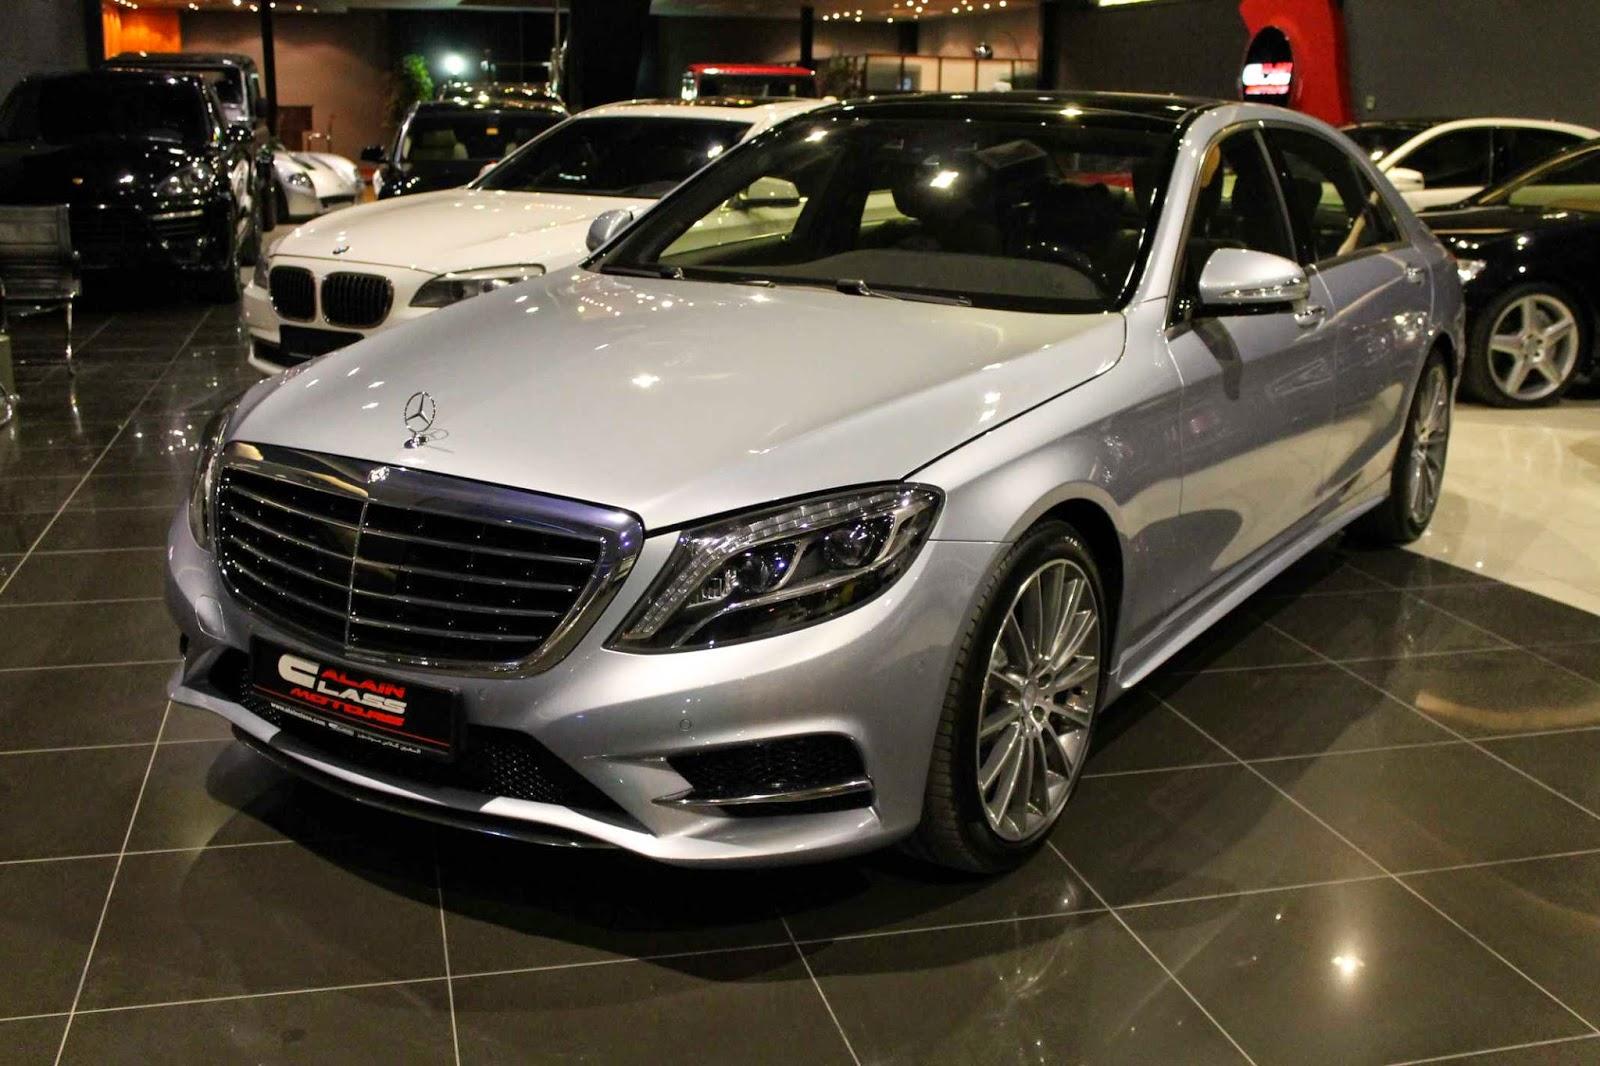 Mercedes benz w222 s500 benztuning for Mercedes benz s500